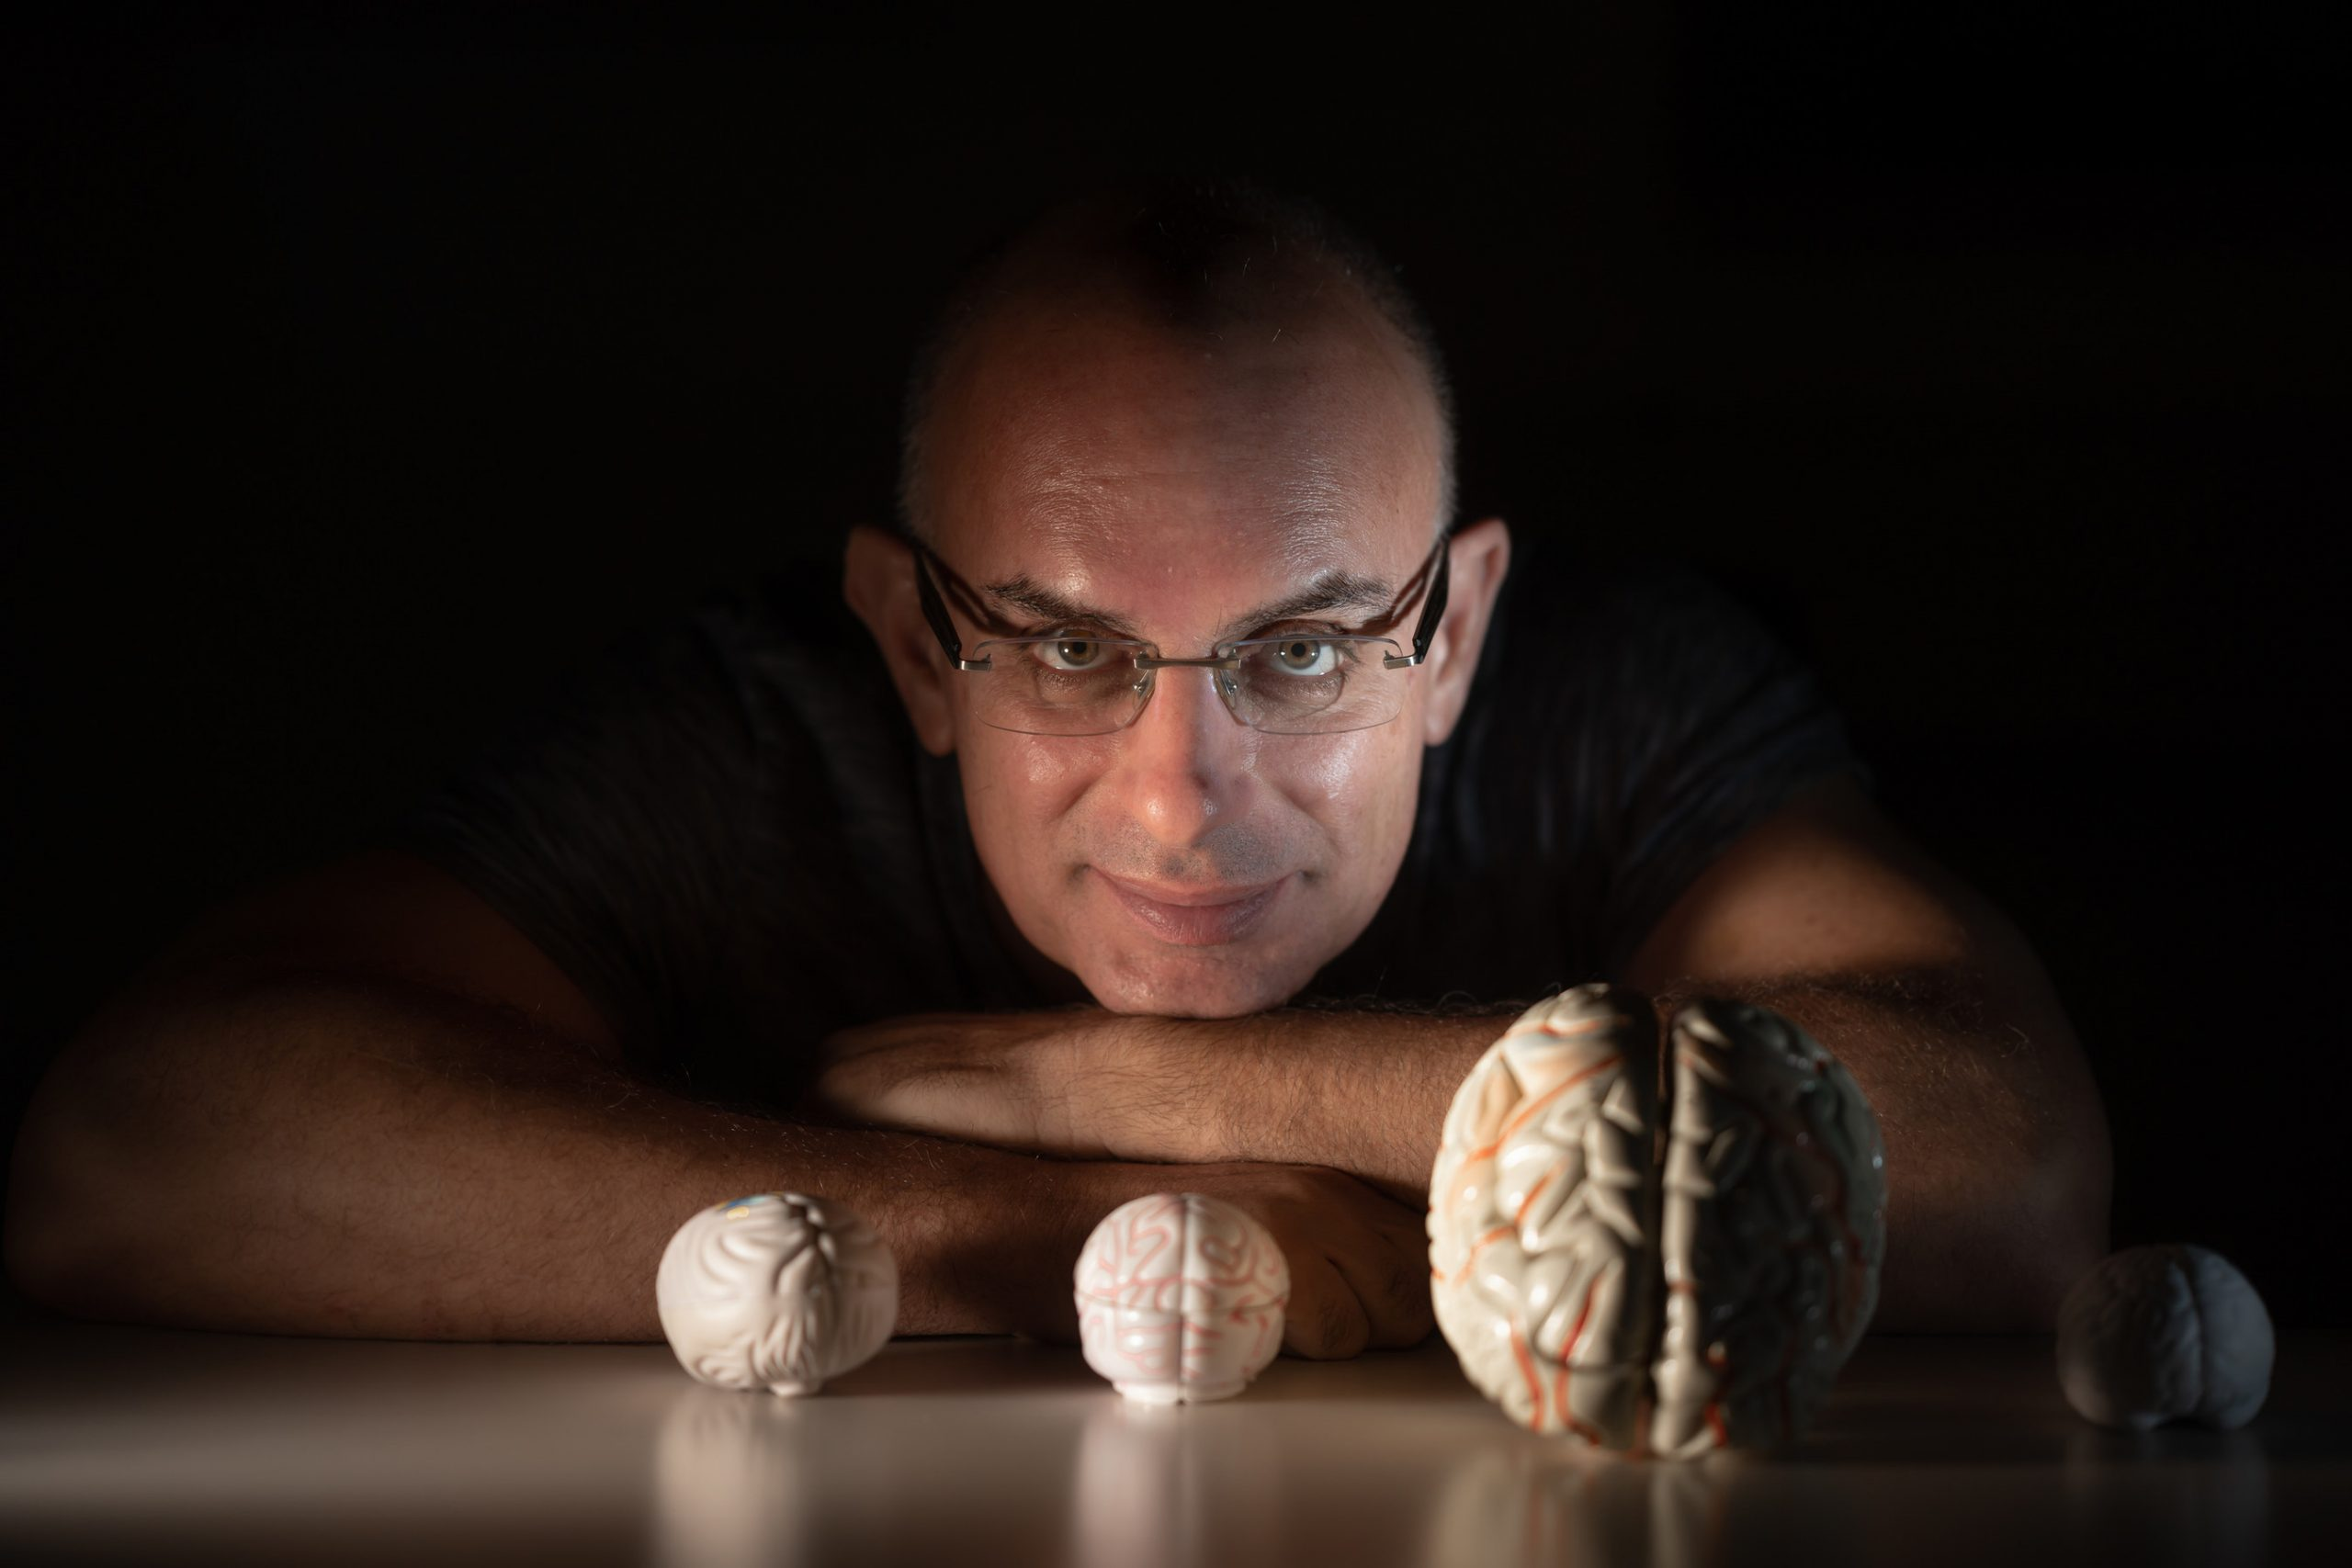 Dr. Oren Shriki, the Department of Cognitive and Brain Sciences at Ben-Gurion University (Credit: Dani Machlis)